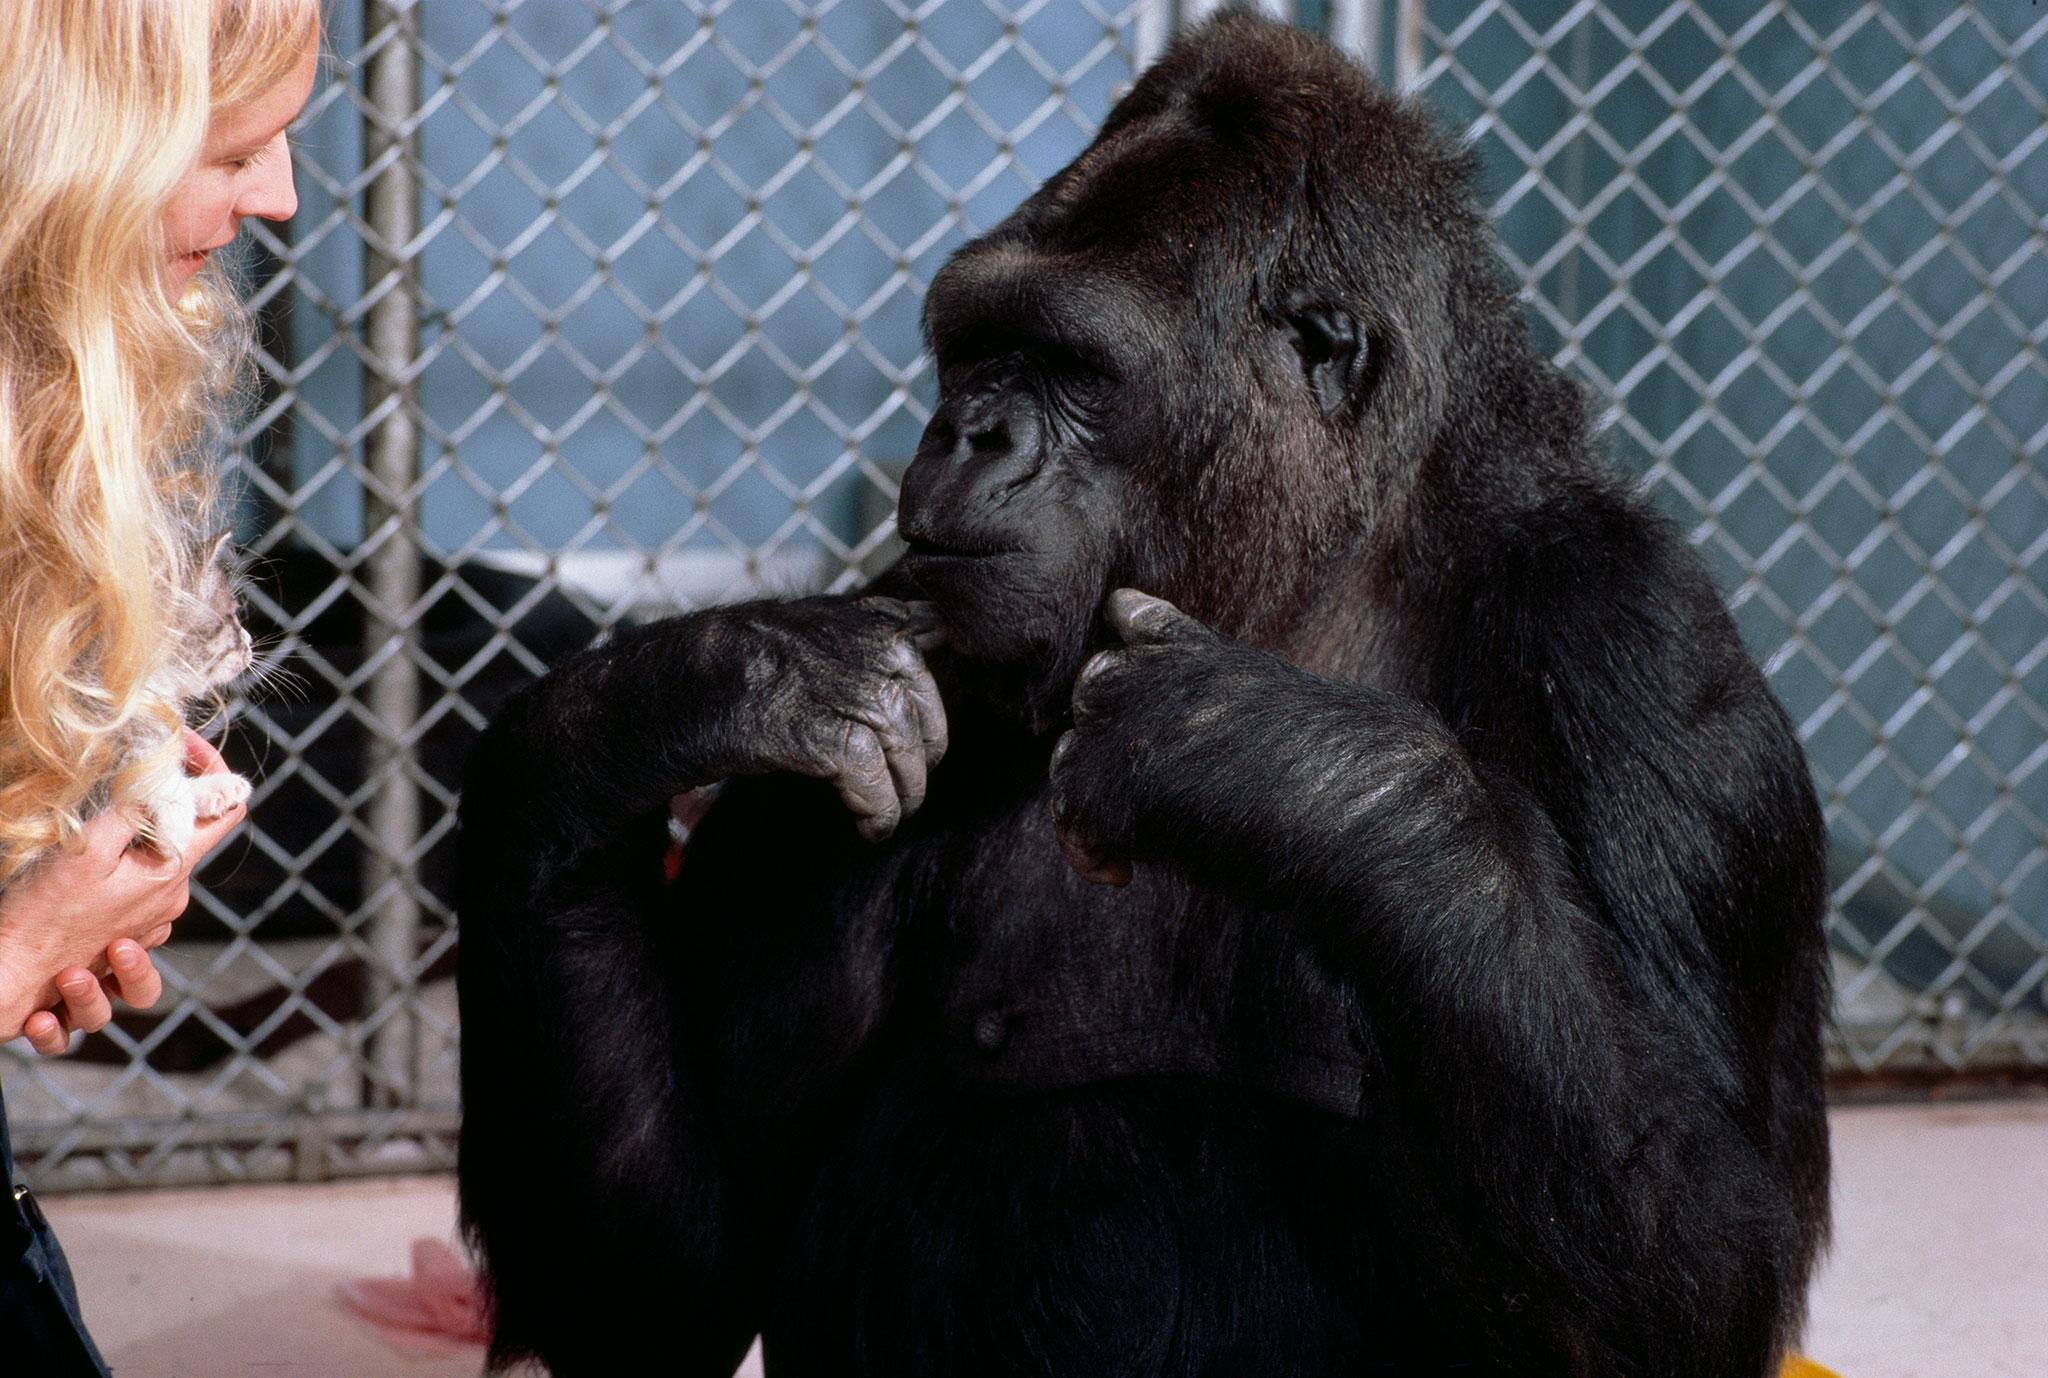 Koko, el gorila que aprendió lenguaje de señas, muerta